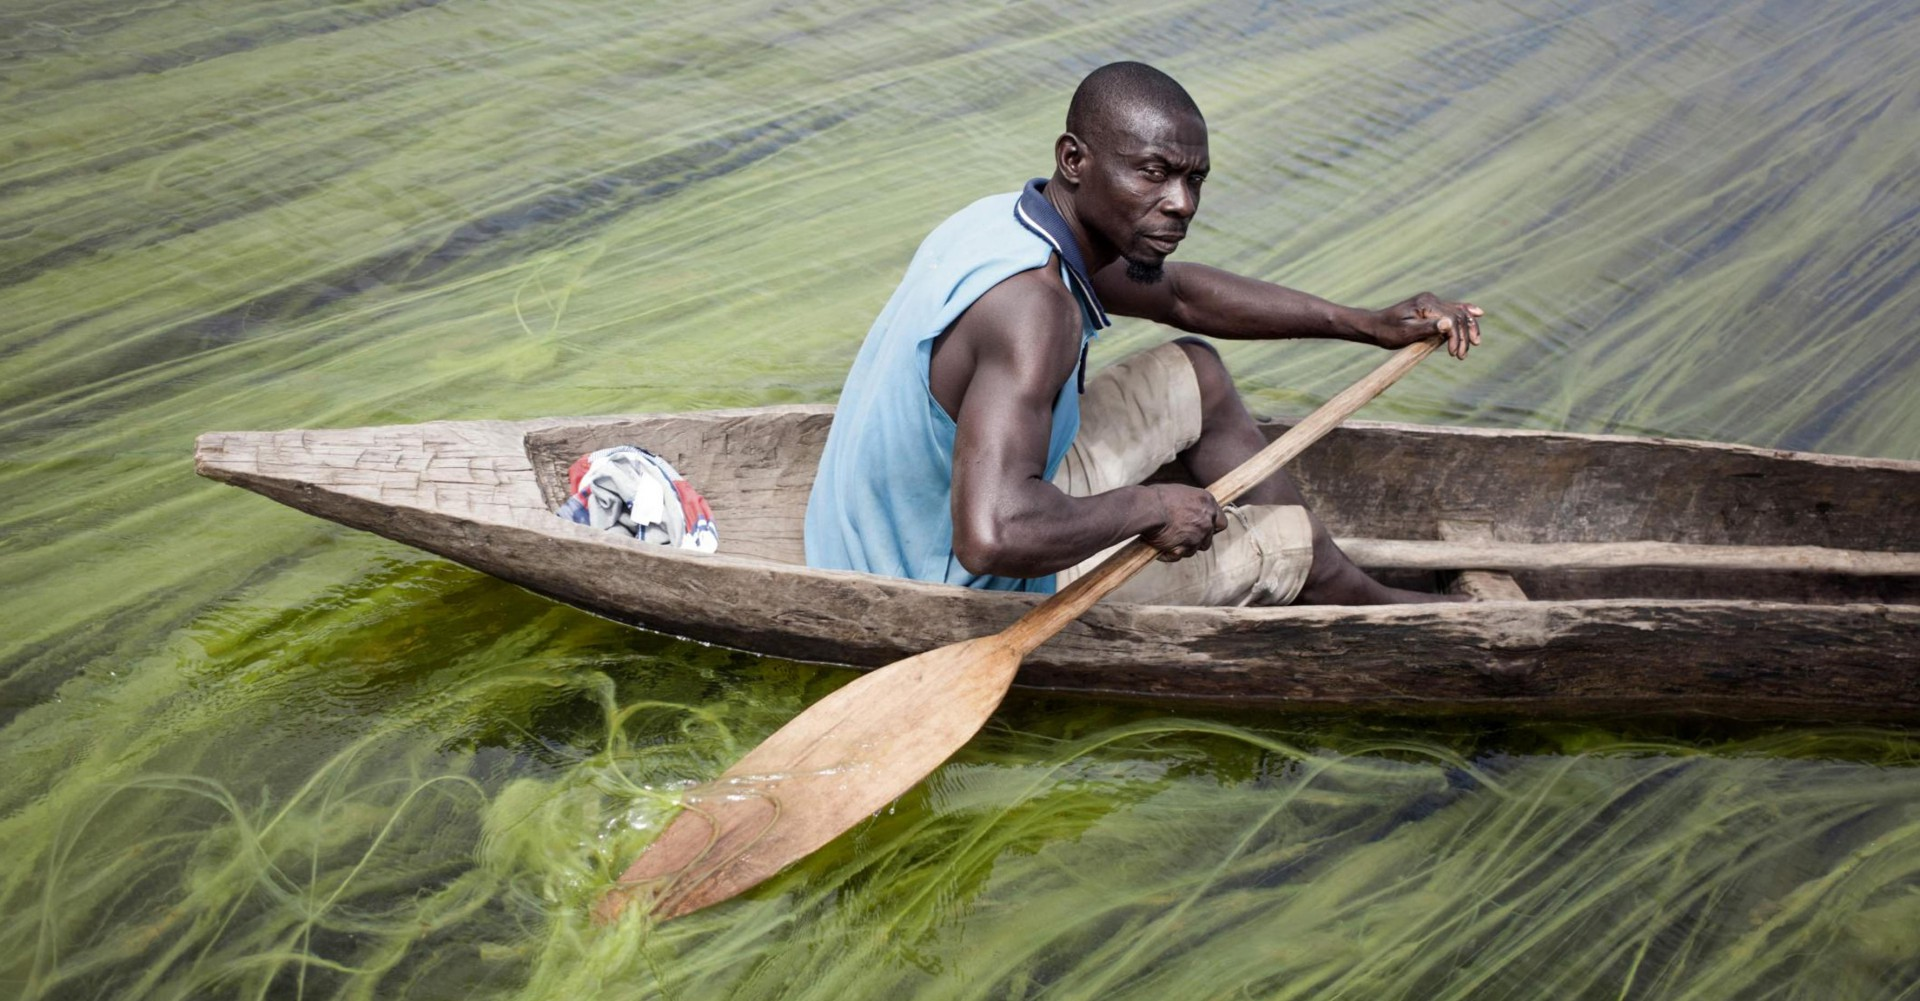 Un uomo su una canoa in Africa (LaPresse)